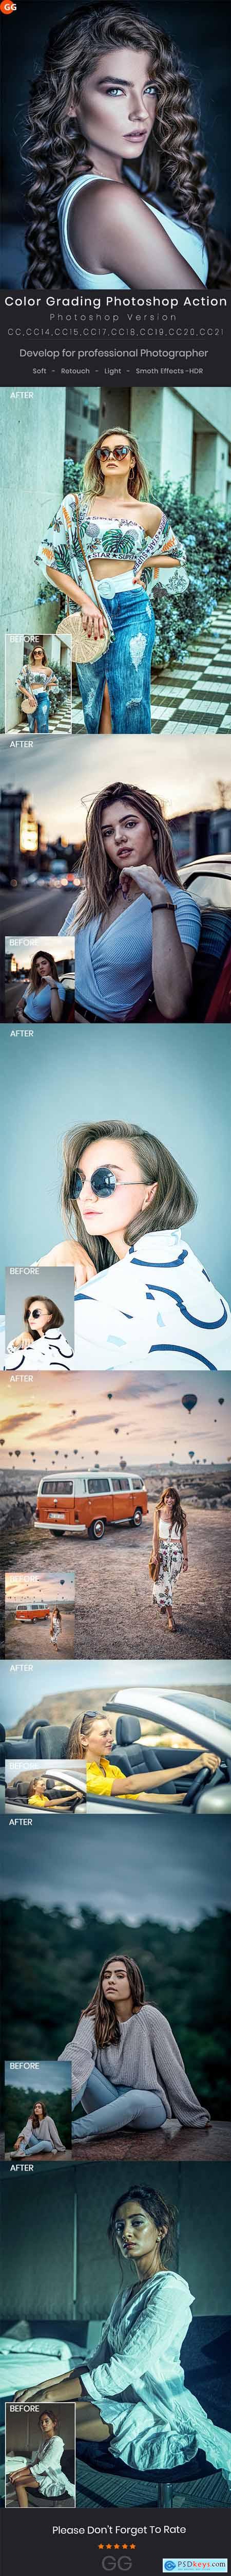 Color Grading Photoshop Action 29735574